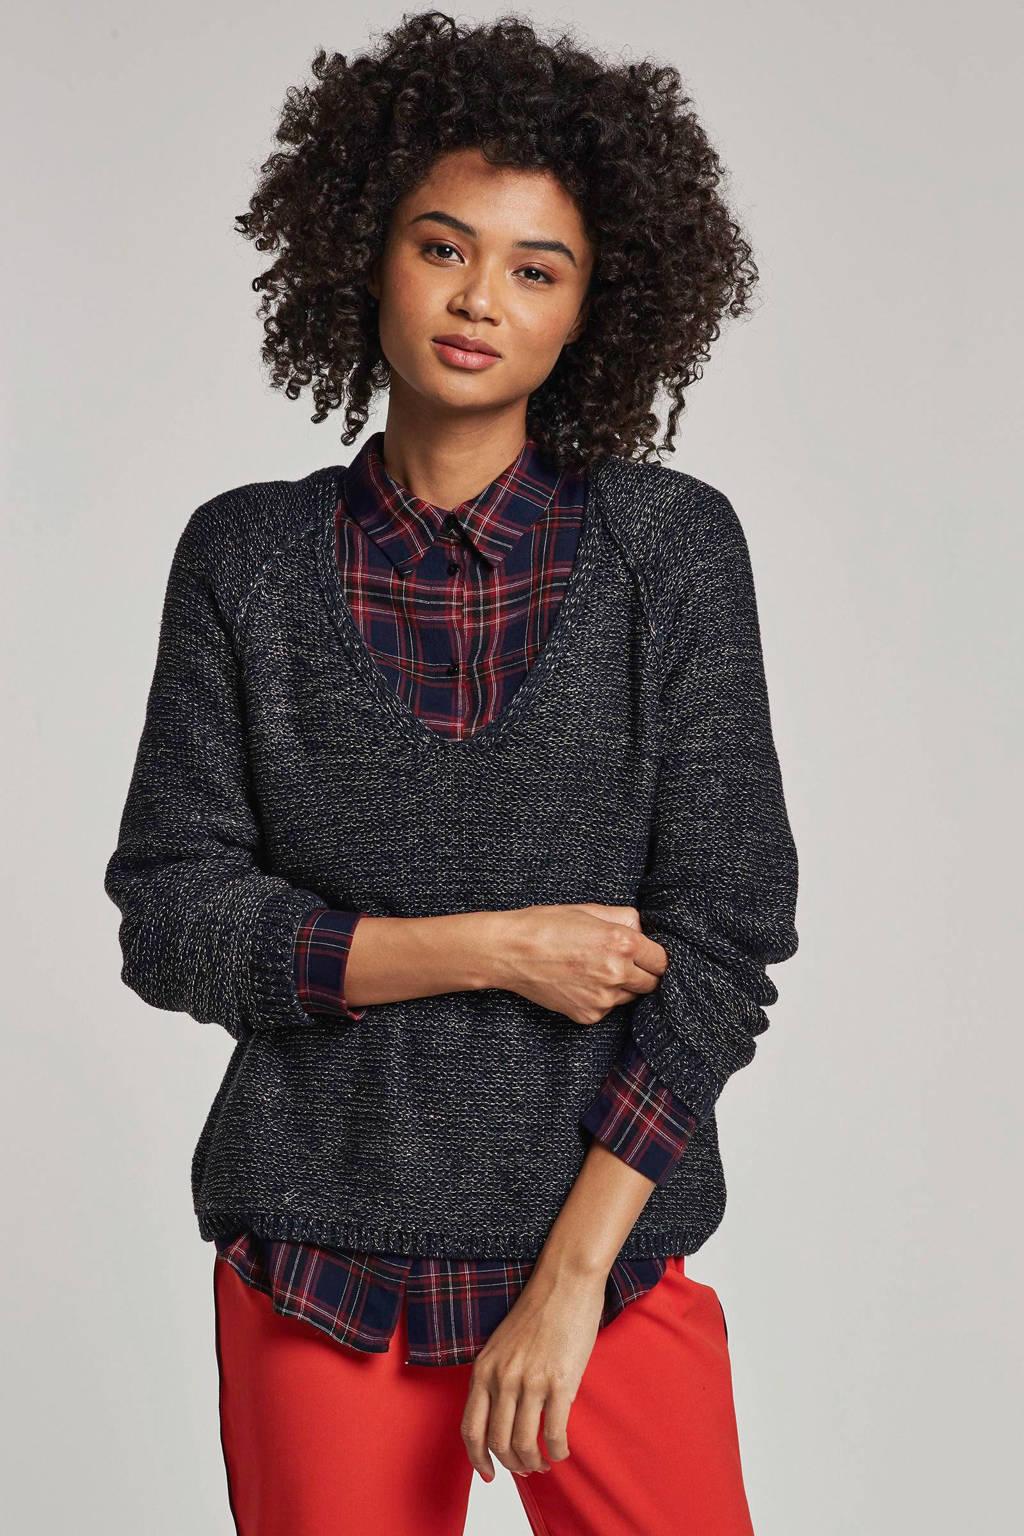 VILA gebreide trui met glitter details, Donkerblauw/goud